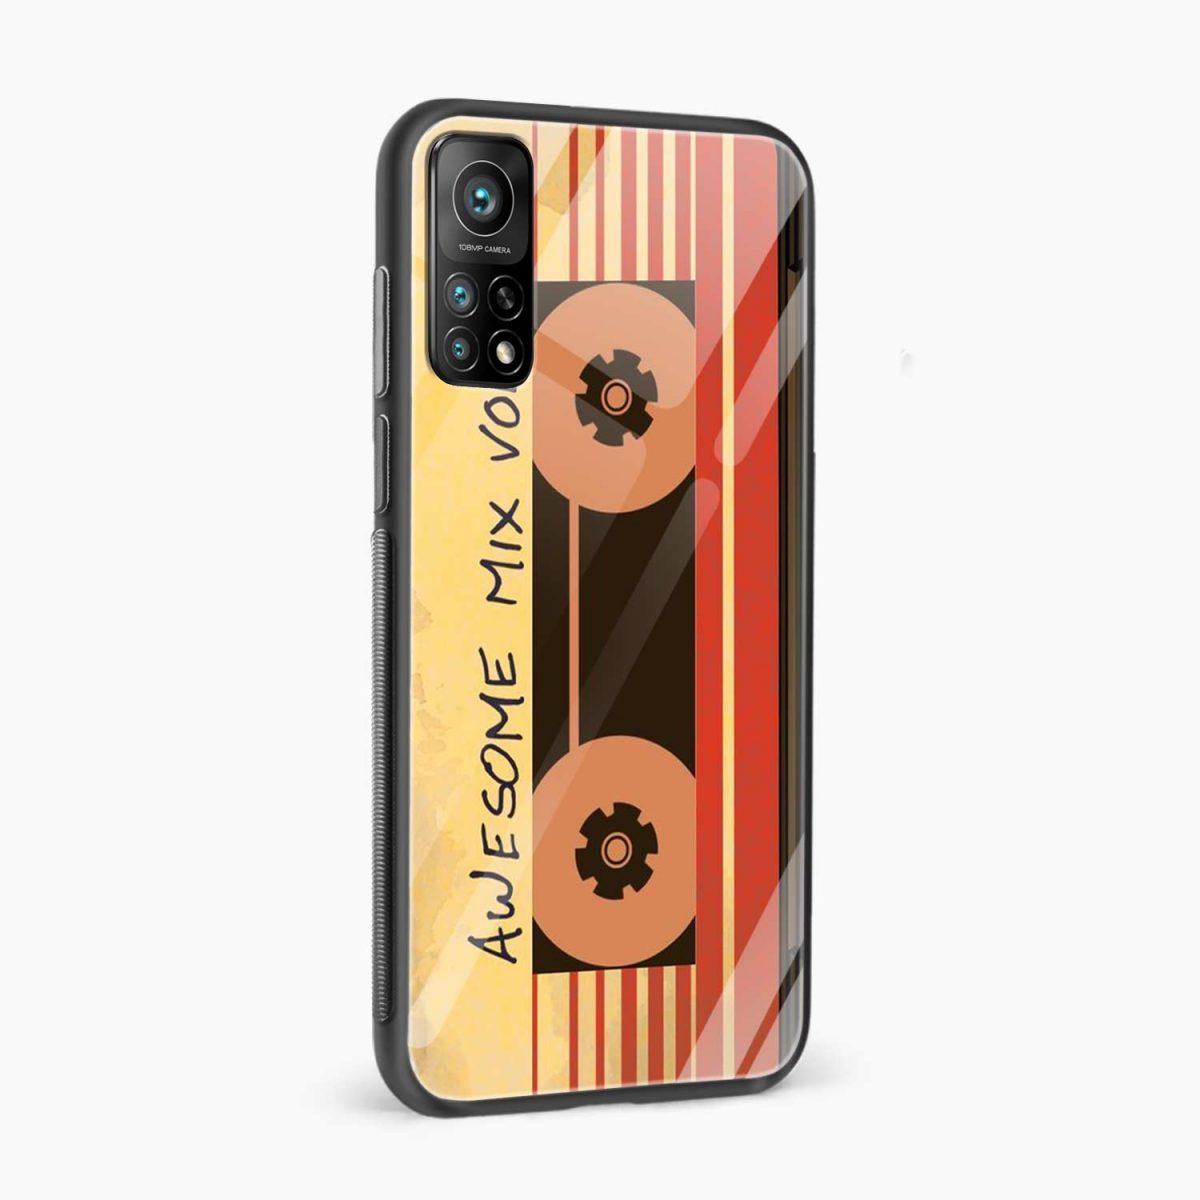 music cassette xiaomi mi 10t pro back cover side view